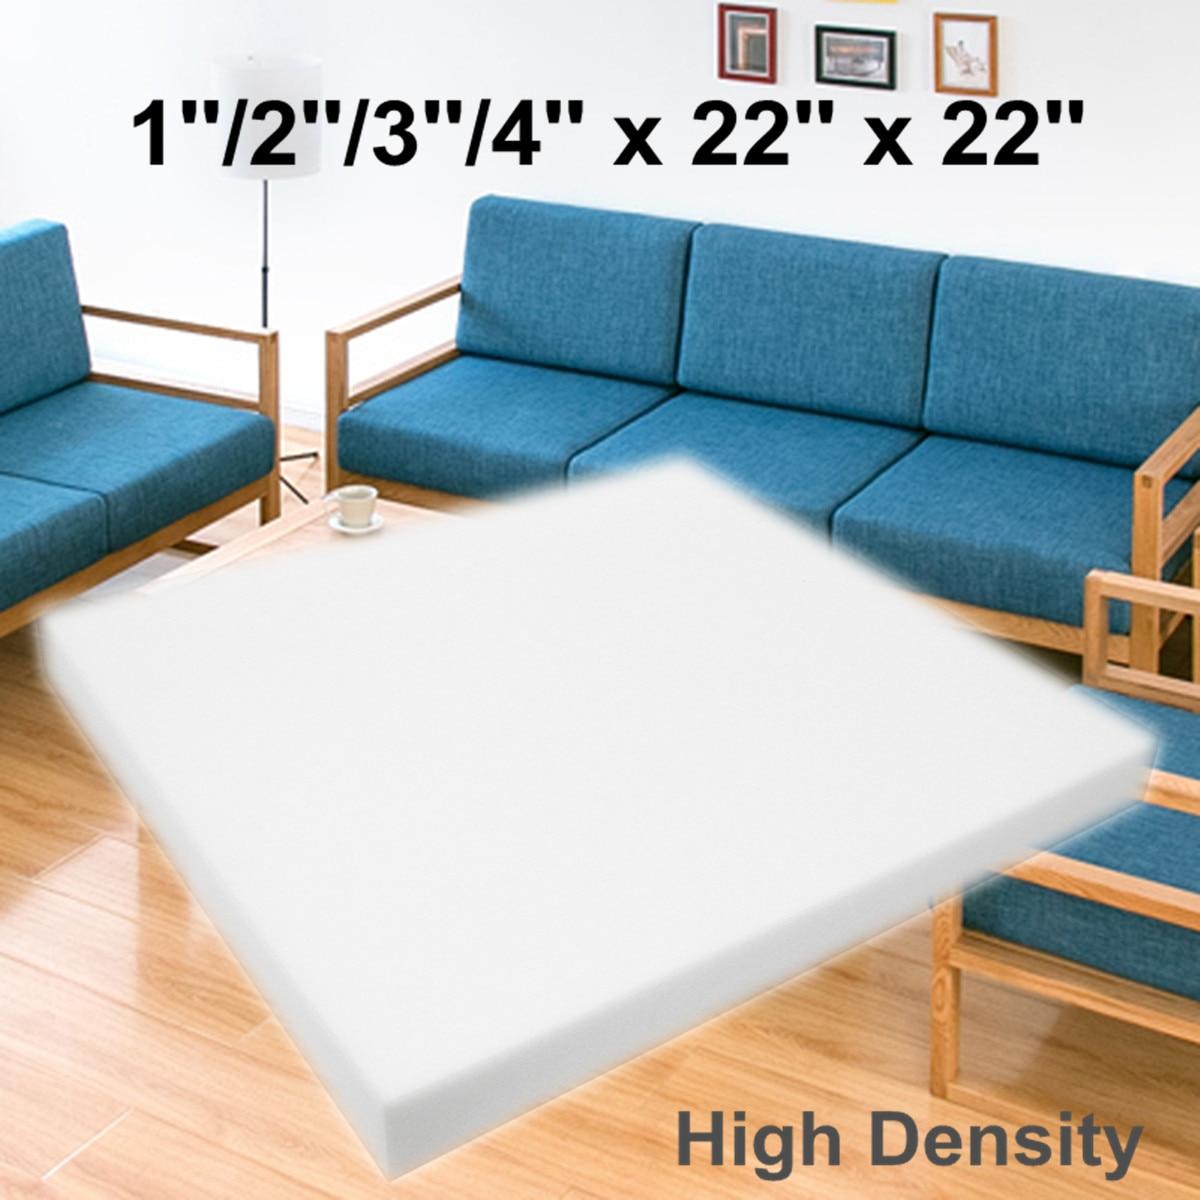 55x55cm High Density Upholstery Cushion Foam Chair Sofa Seat Foam Pad Sheet Mattress Bed Floor High Density Upholstery Cushion